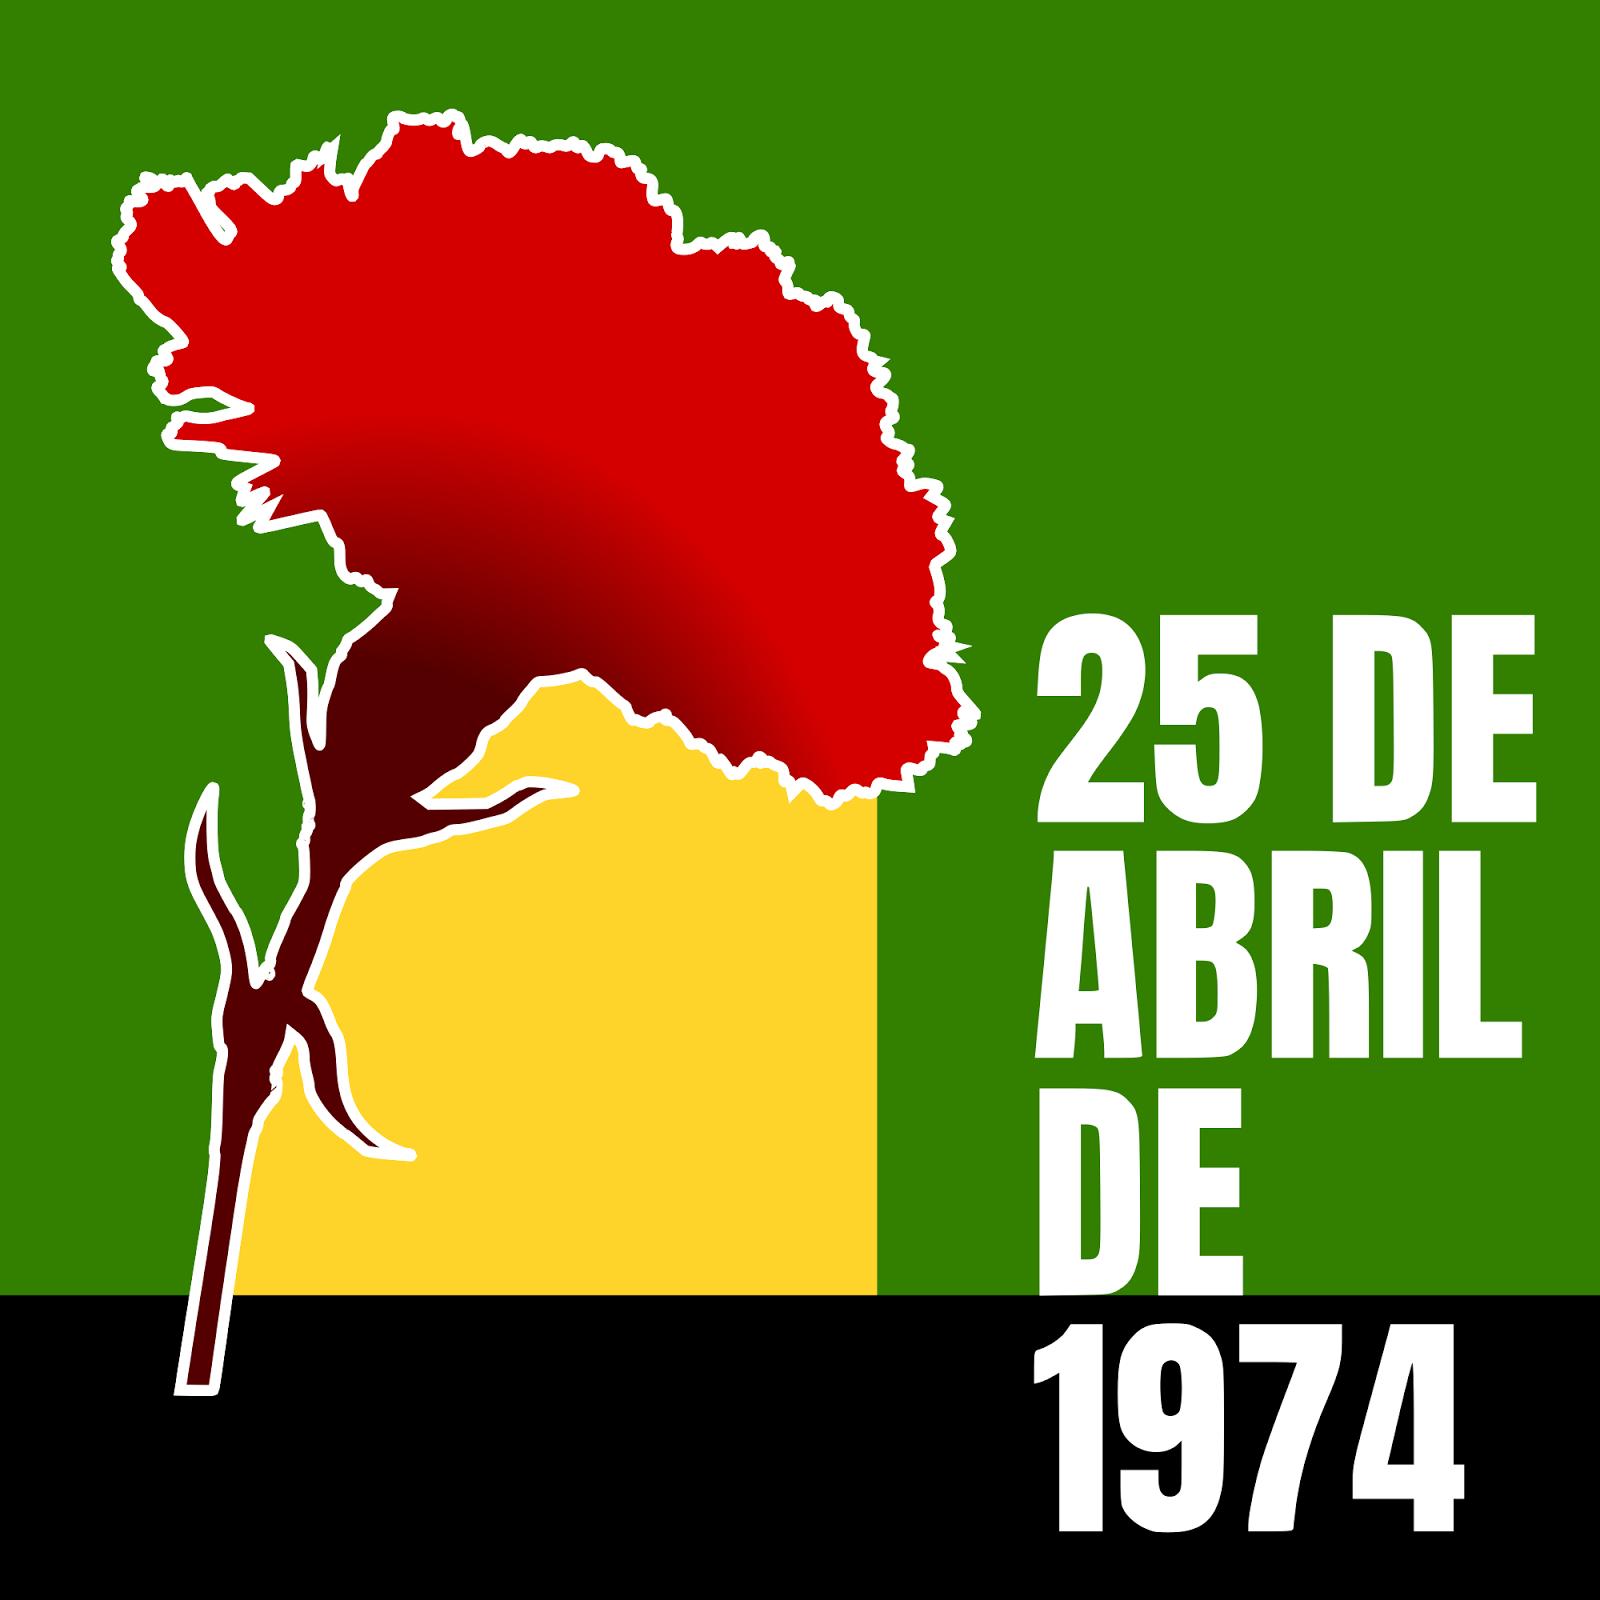 Santa Nostalgia: 25 De Abril De 1974